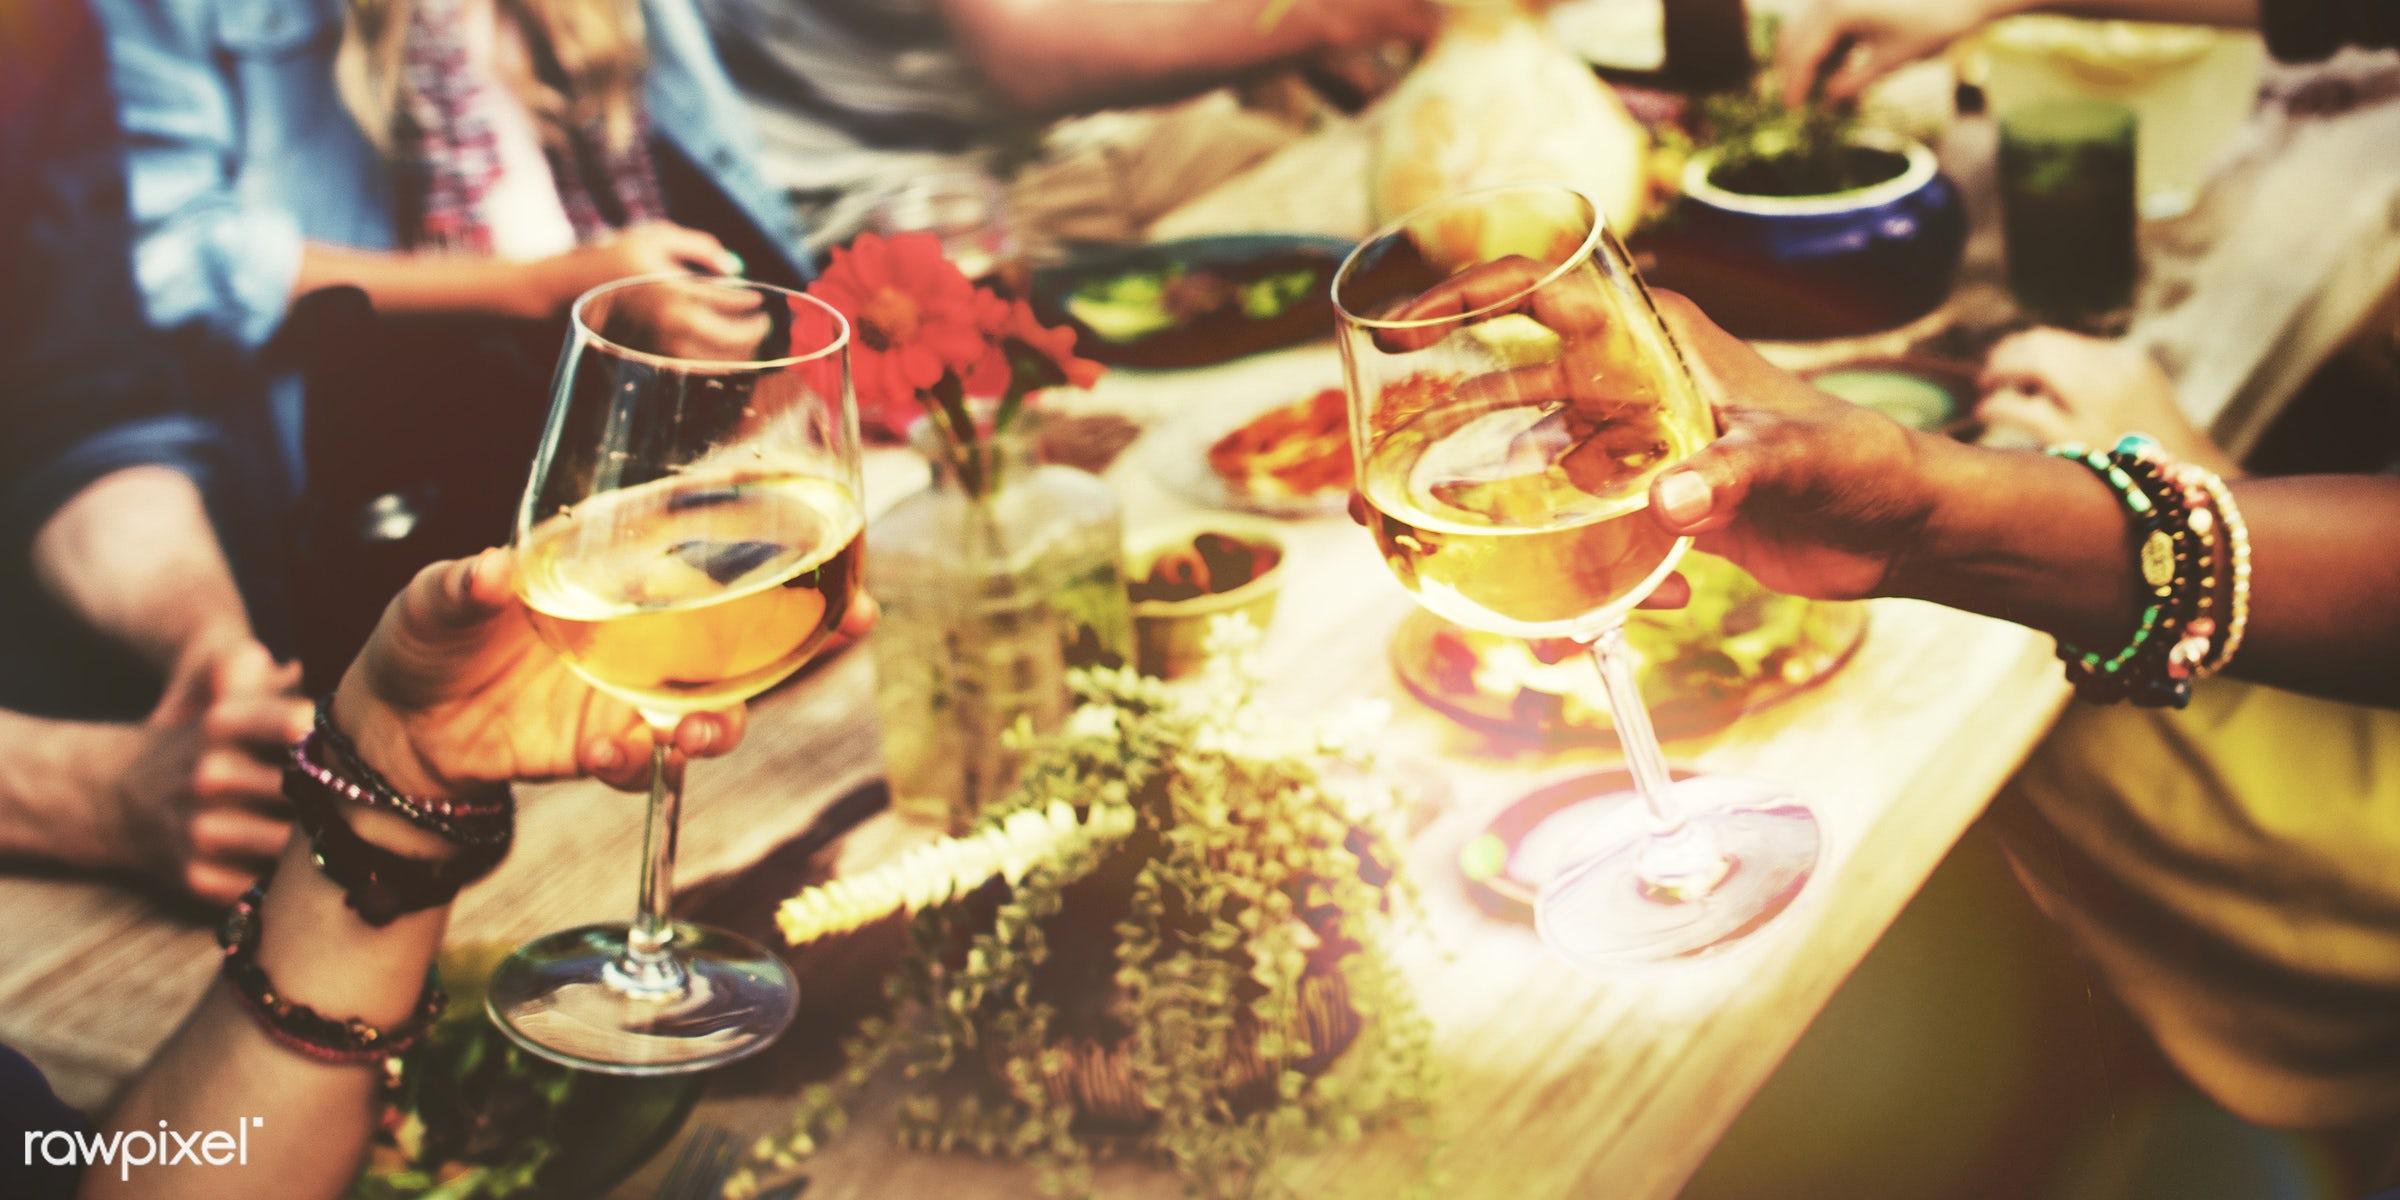 beer, active, beach, beverage, bonding, casual, celebration, cheerful, cheers, dinner, diversity, drink, drinking, event,...